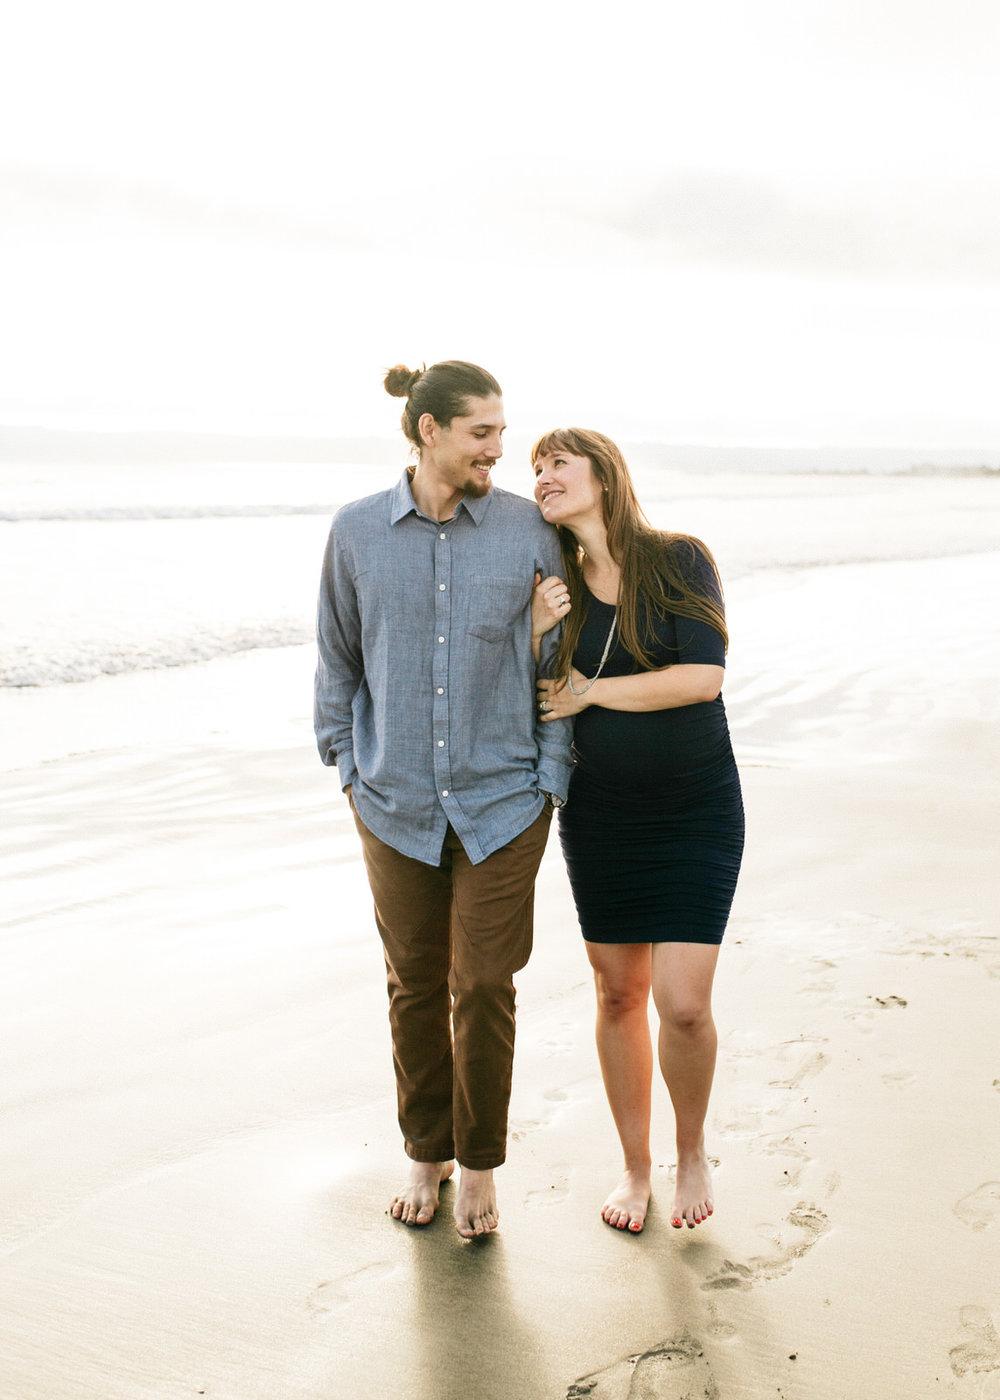 SamErica Studios - San Diego Maternity Photographer - Babymoon in Coronado-19.jpg